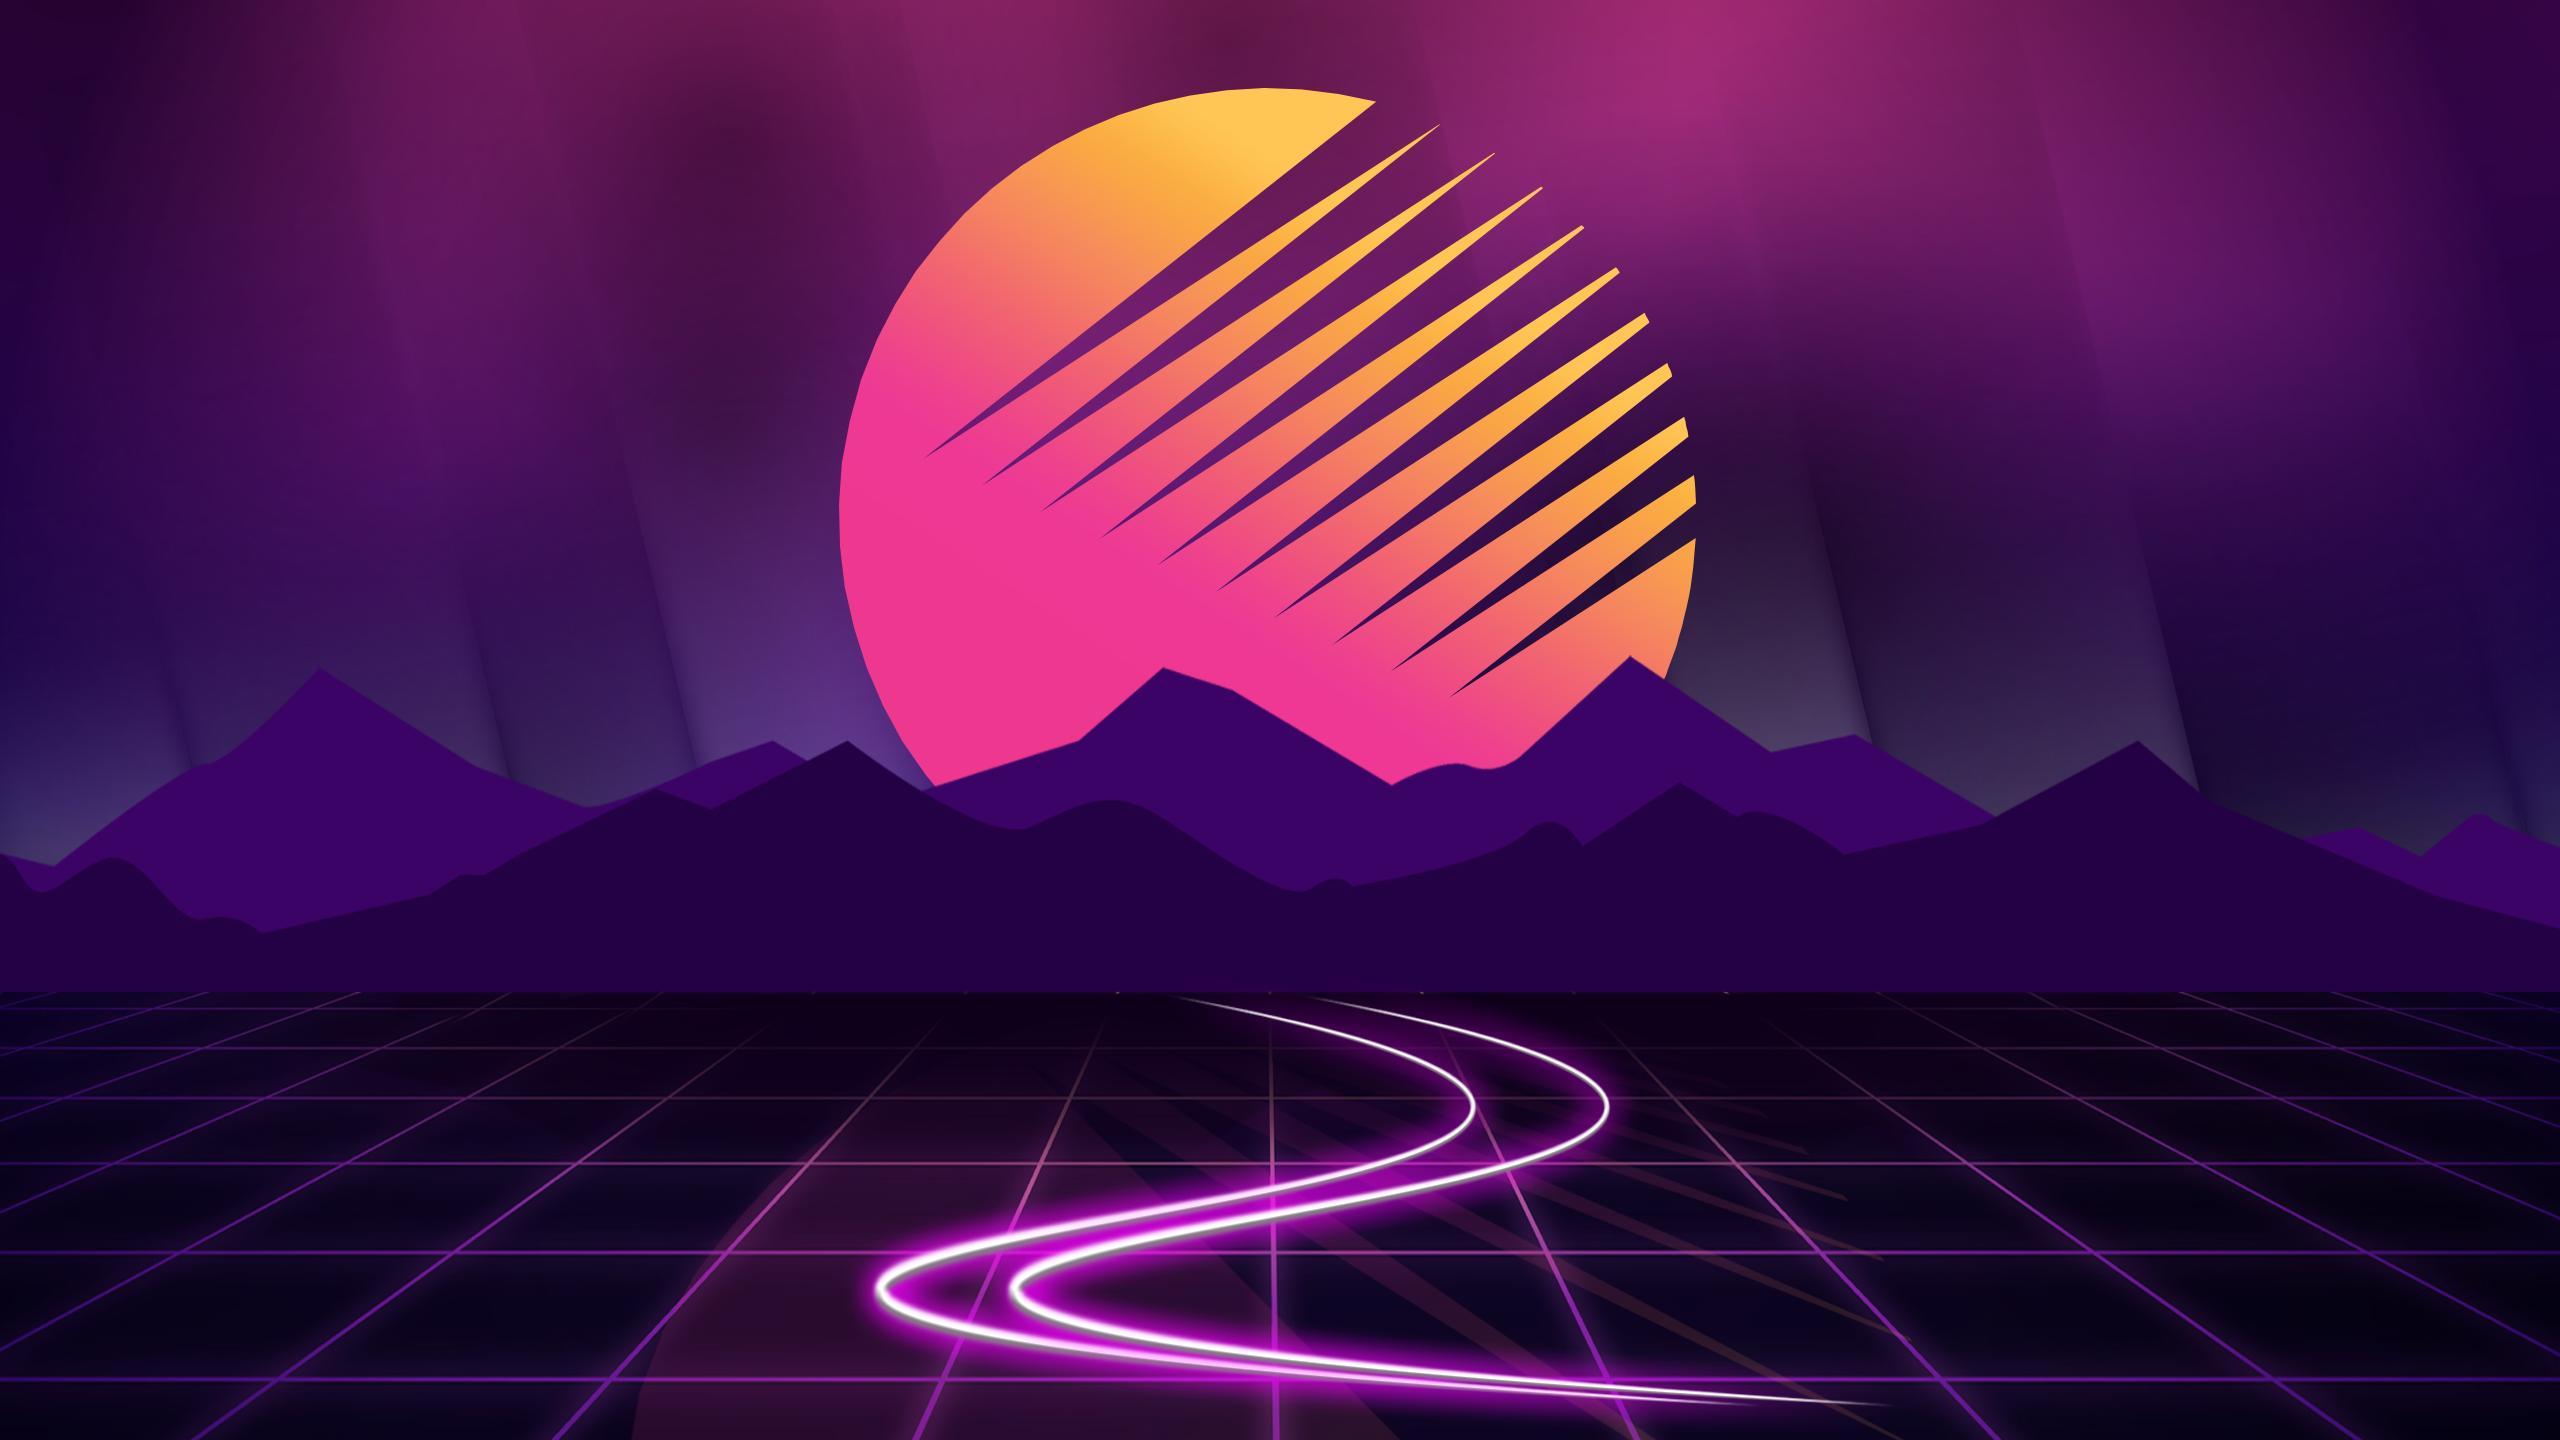 Retrowave Sunset 2560x1440 X Post R Vectorwallpapers Dark Background Wallpaper Vaporwave Wallpaper Neon Wallpaper